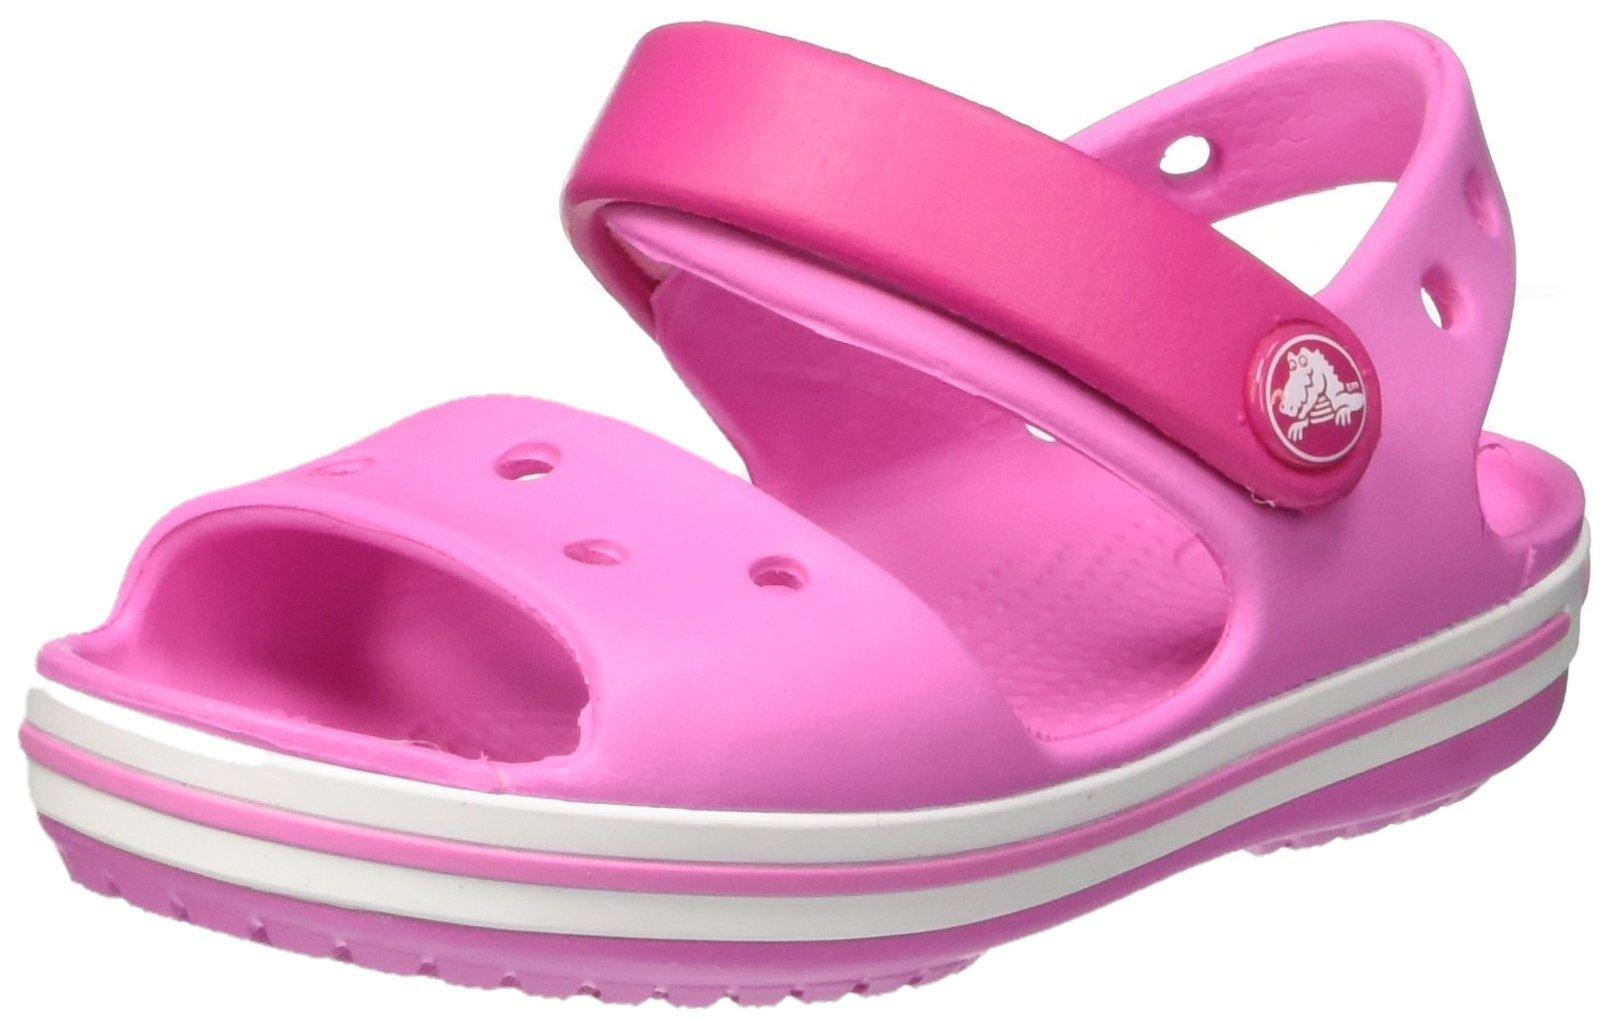 Crocs Unisex-Kids Crocband Sandal, Candy Pink/Party Pink, 2 M US Little Kid